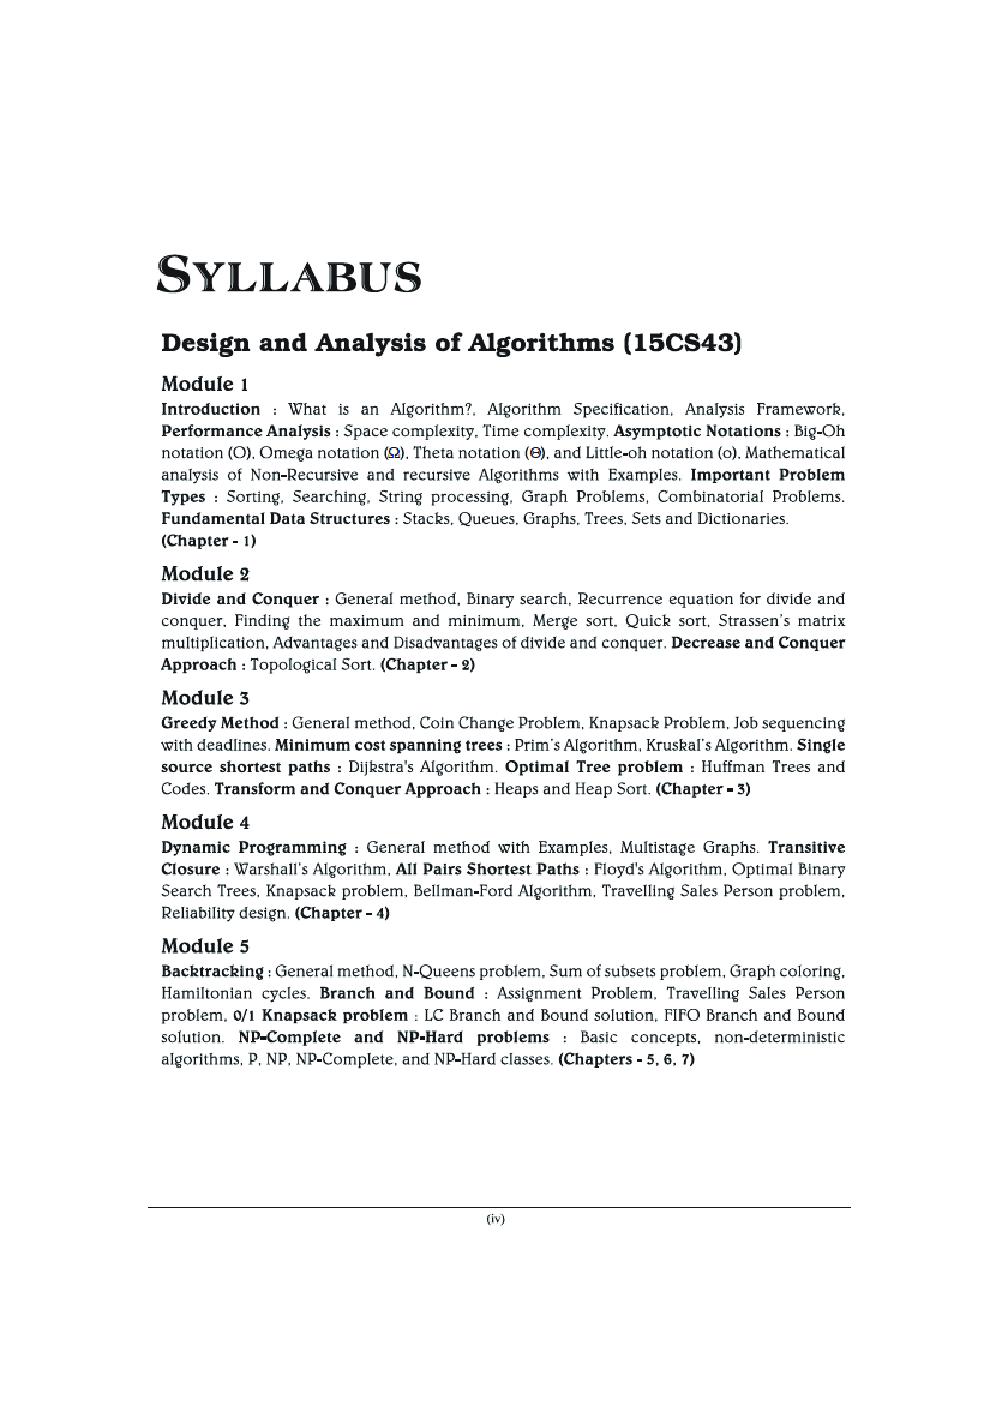 Design And Analysis Of Algorithms For VTU Course 17 CBCS (IV- CSE - 17CS43) - Page 5